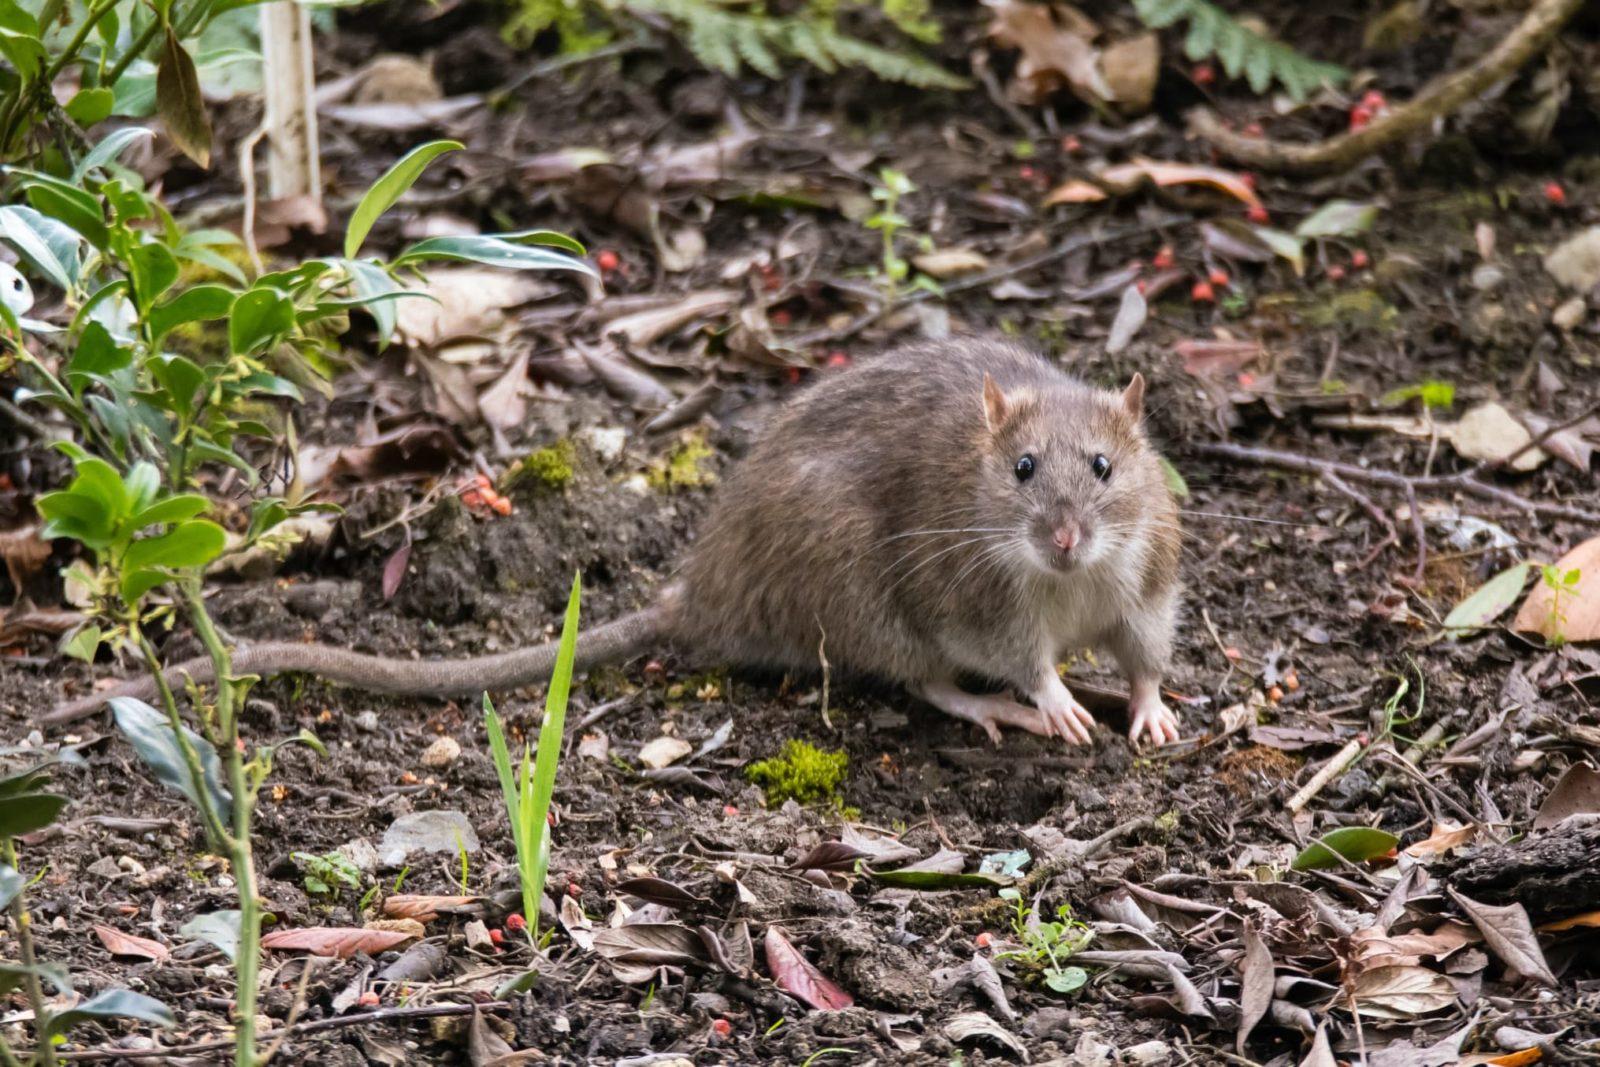 brown rat on soil in garden